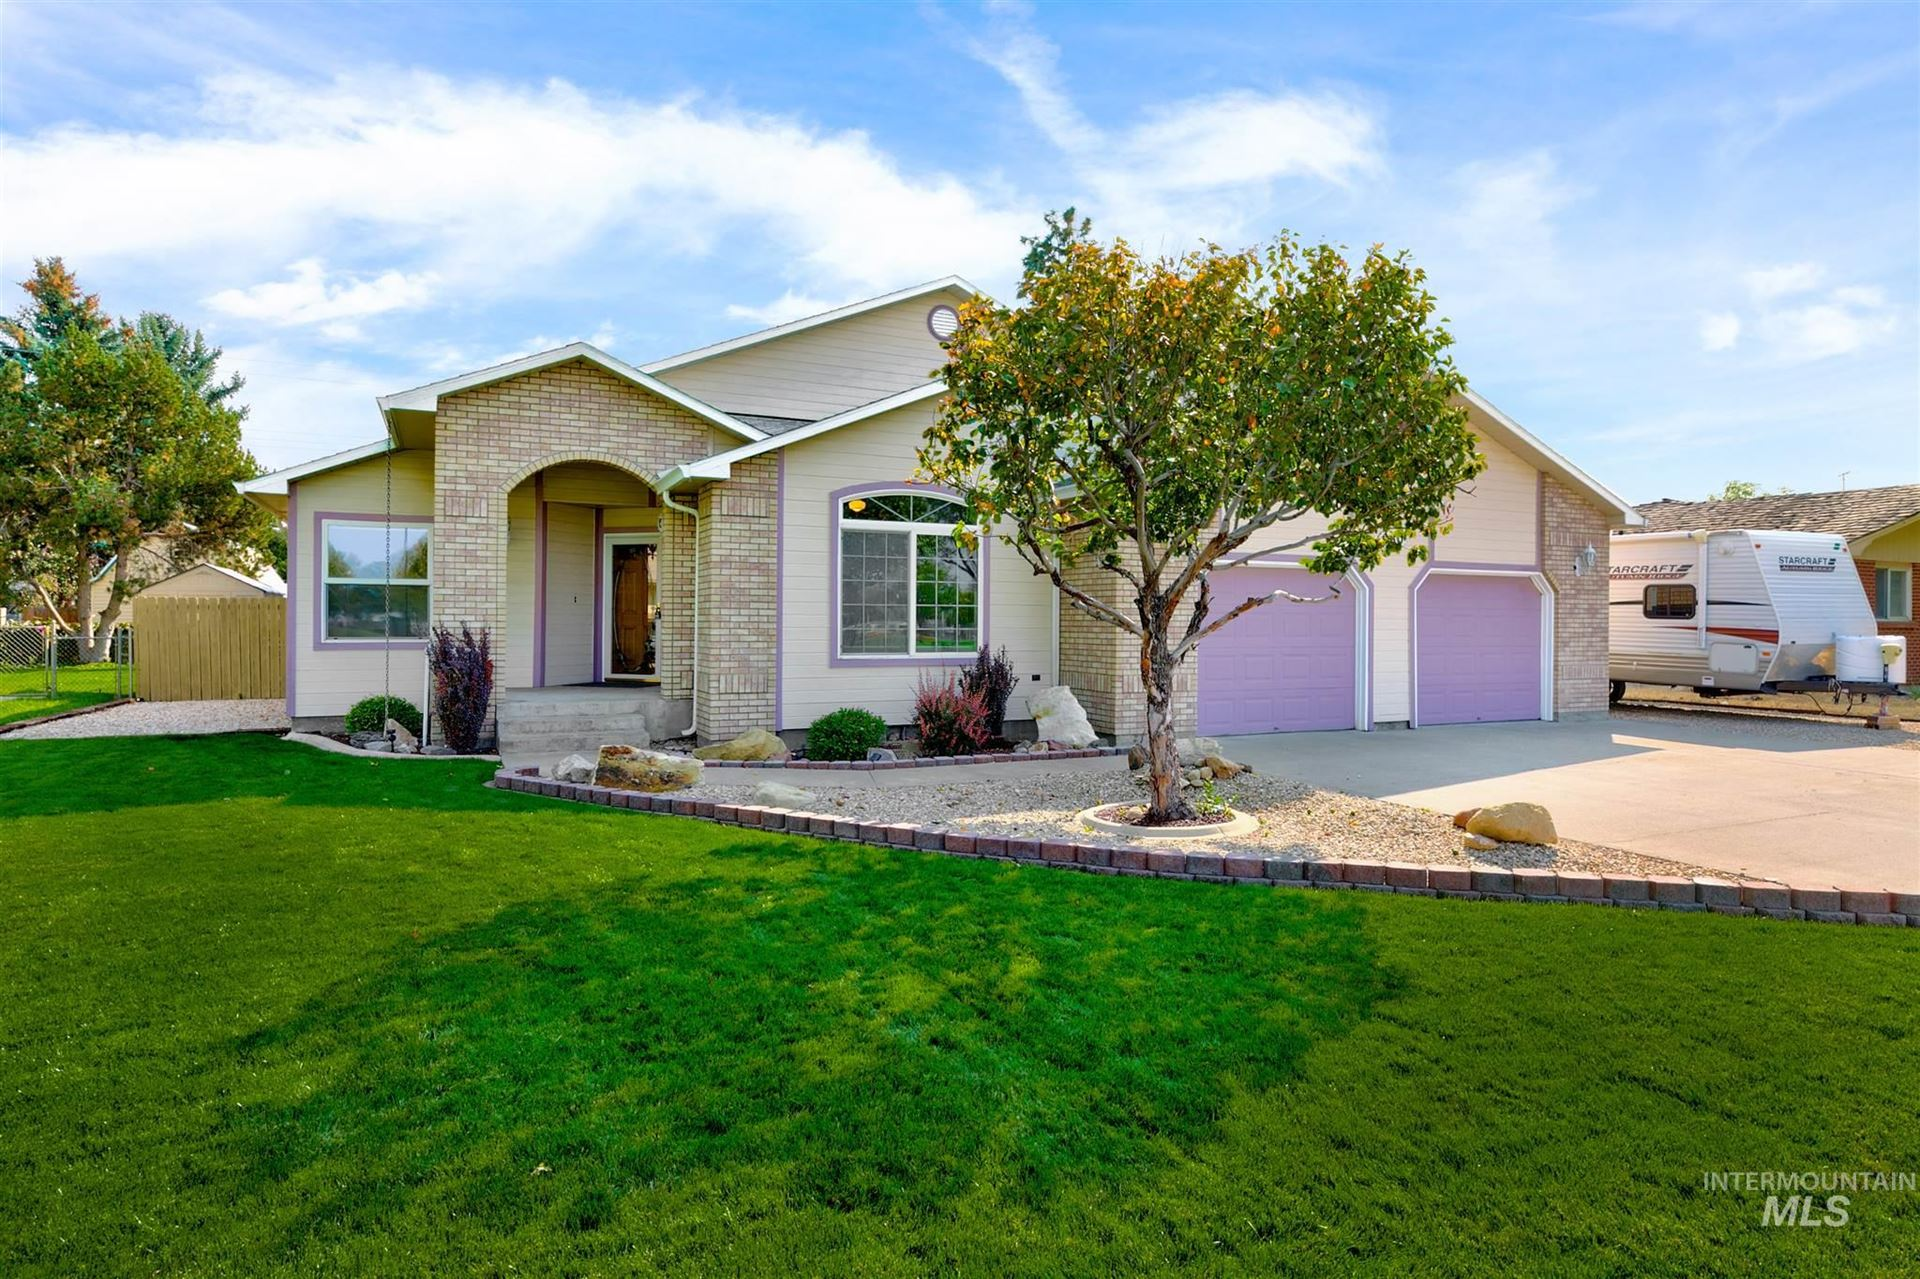 960 N 5th E, Mountain Home, ID 83647-2114 - MLS#: 98782849